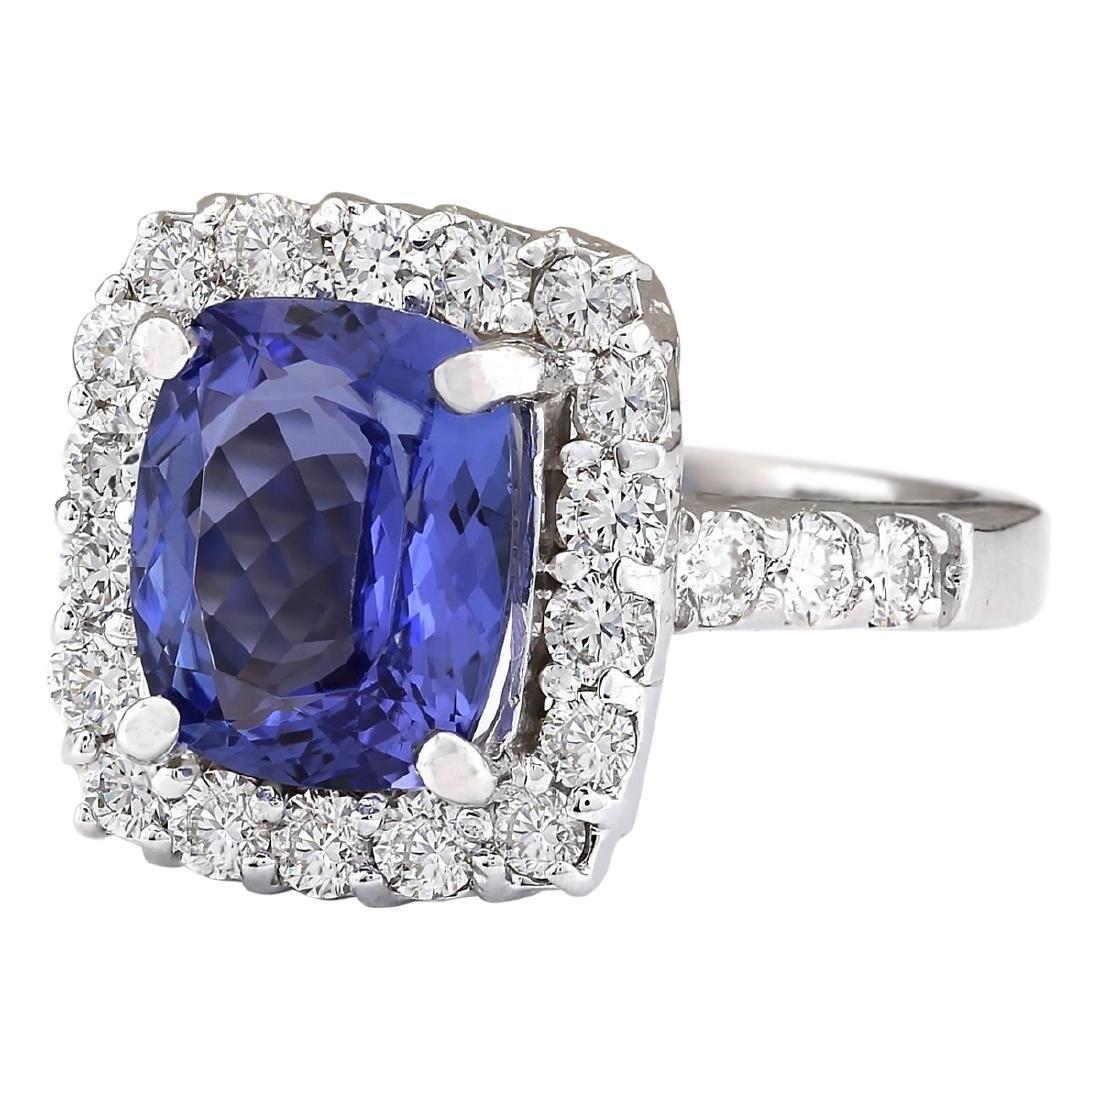 4.95 CTW Natural Blue Tanzanite And Diamond Ring 18K - 2